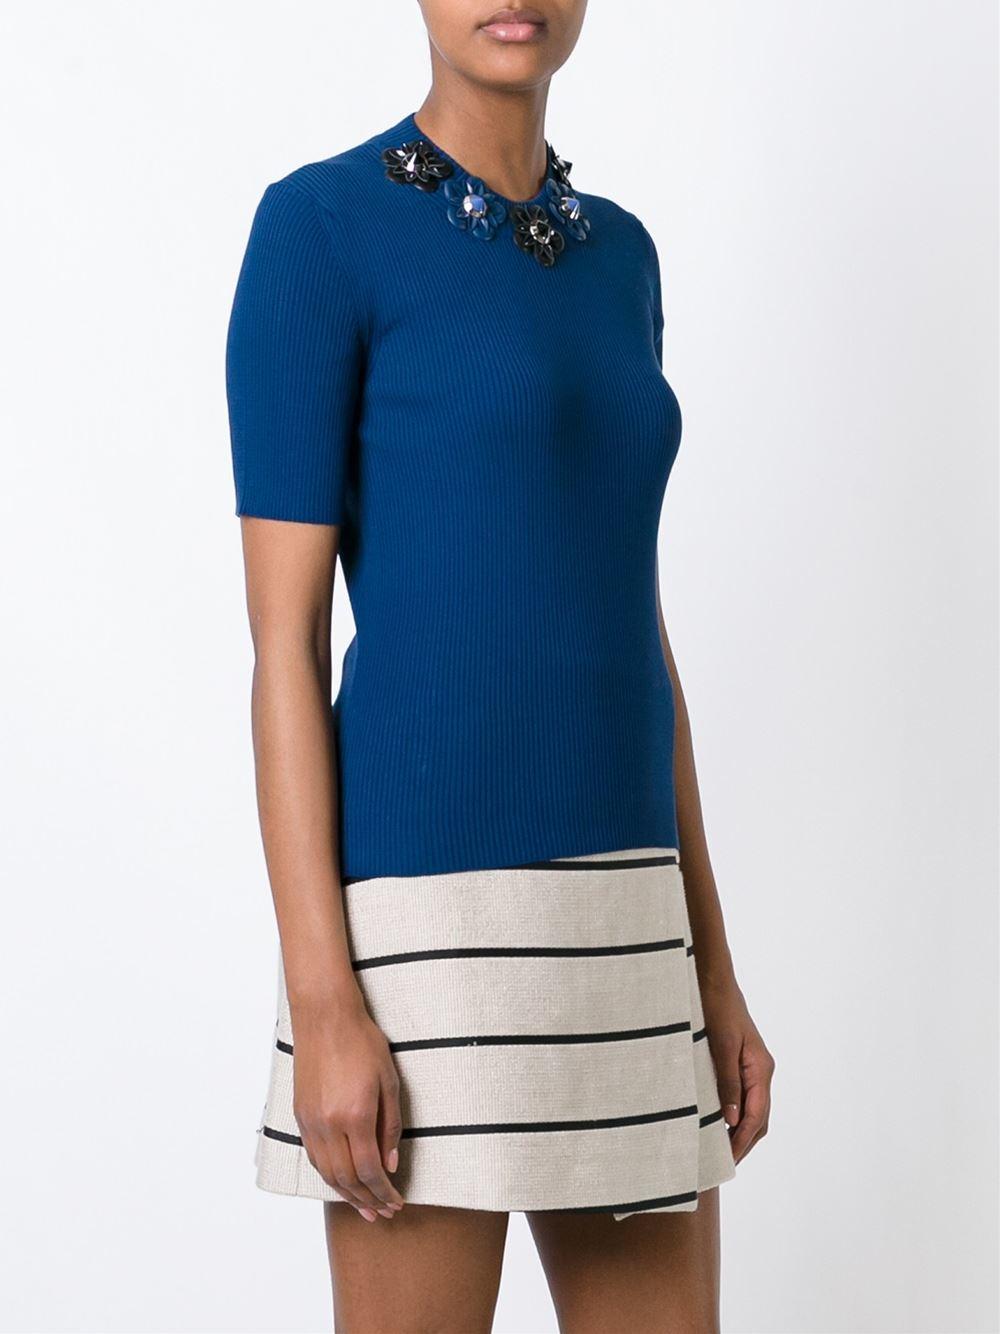 Fendi Flower Appliqu T Shirt In Blue Lyst